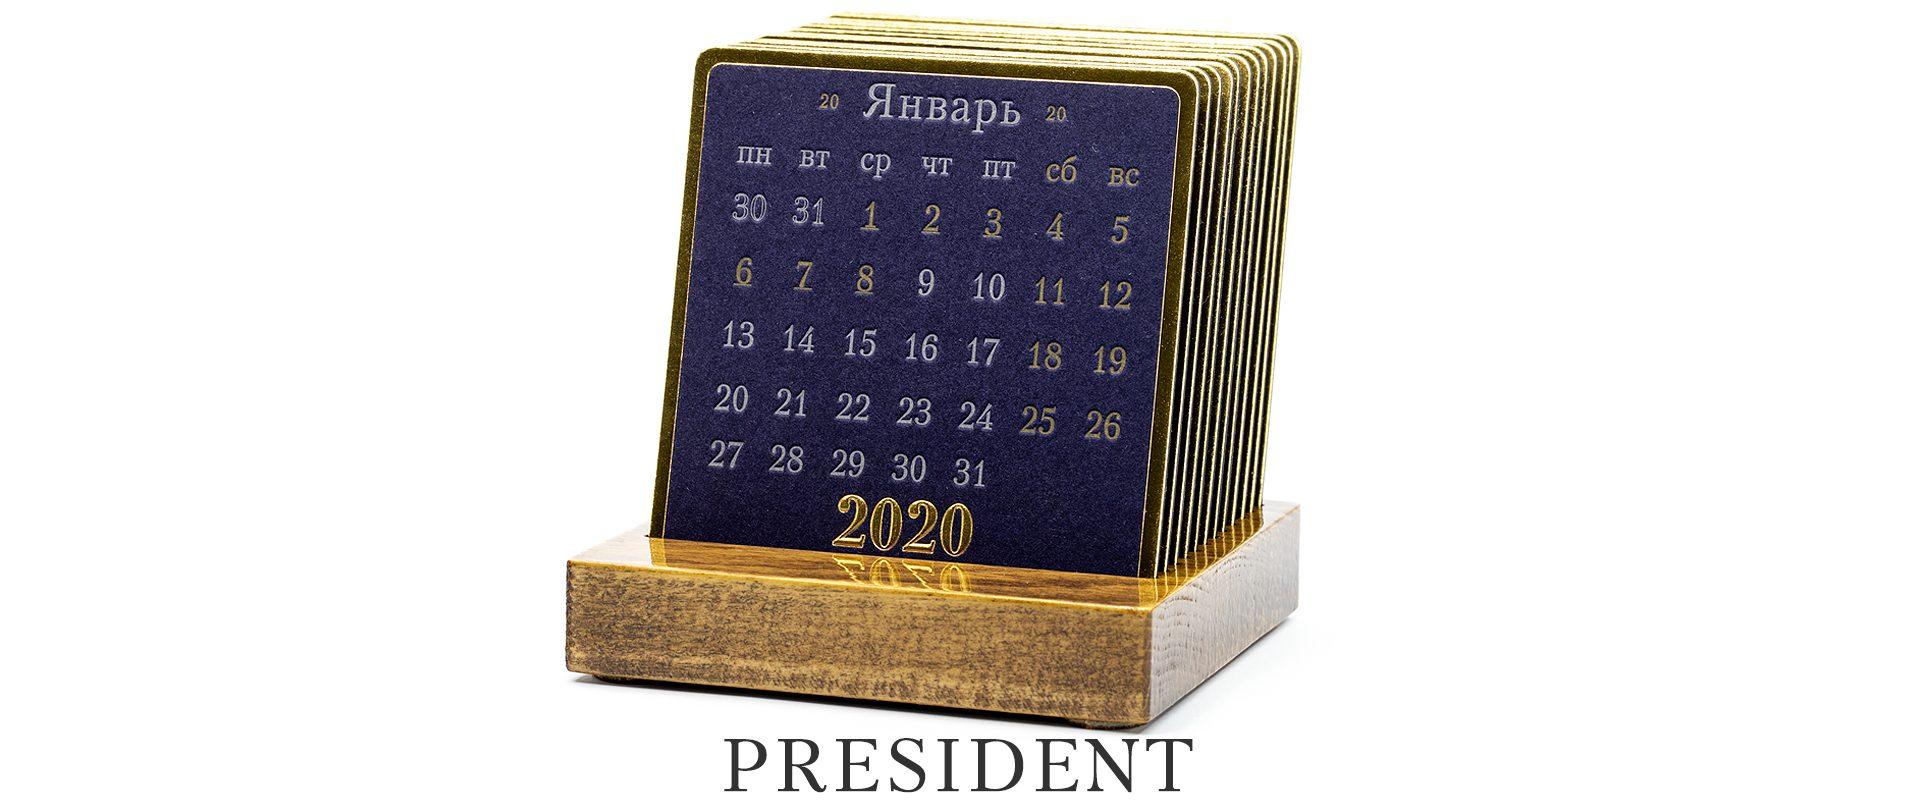 Календарь на подставке изи дерева PRESIDENT 2020 год